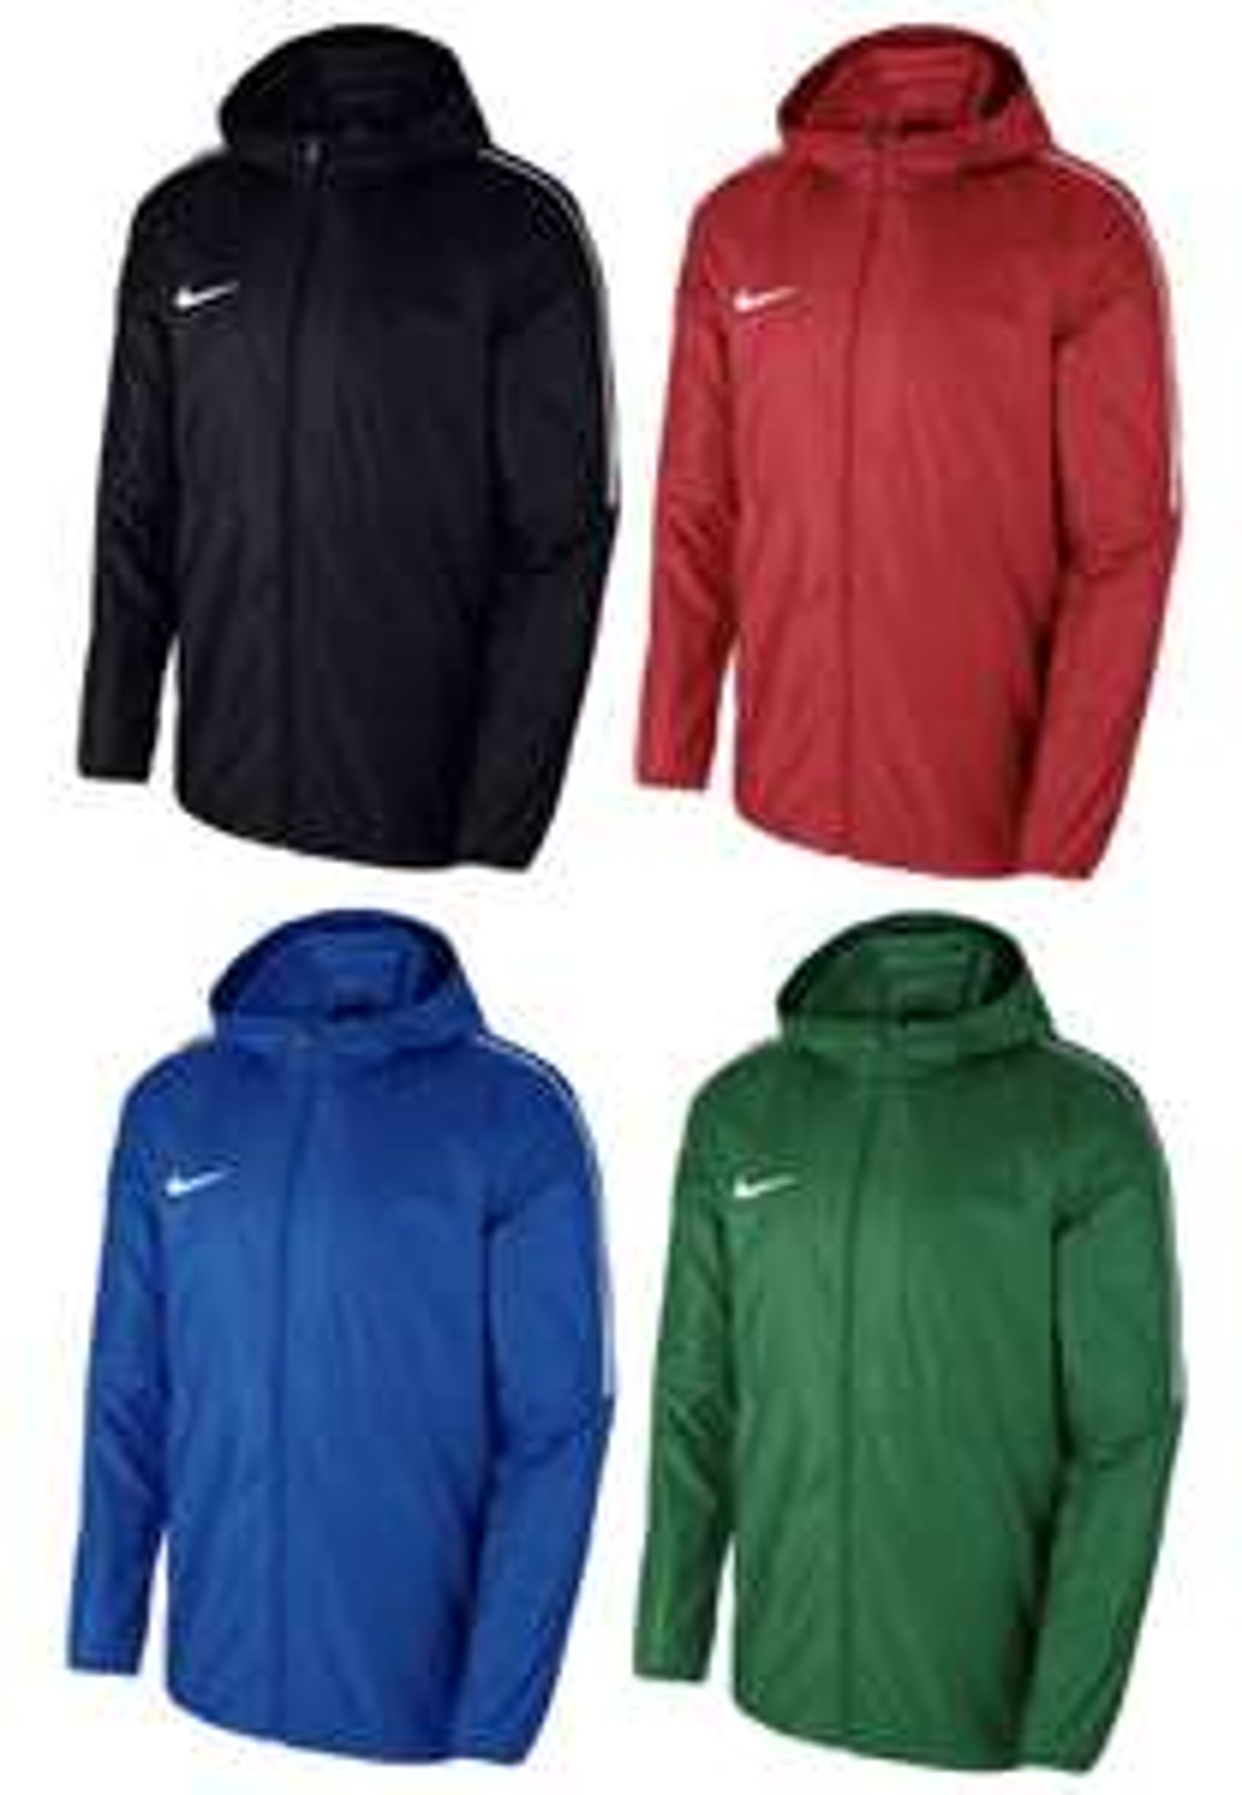 Nike Regenjacke Park 18 in Blau, Rot, Schwarz oder Grün